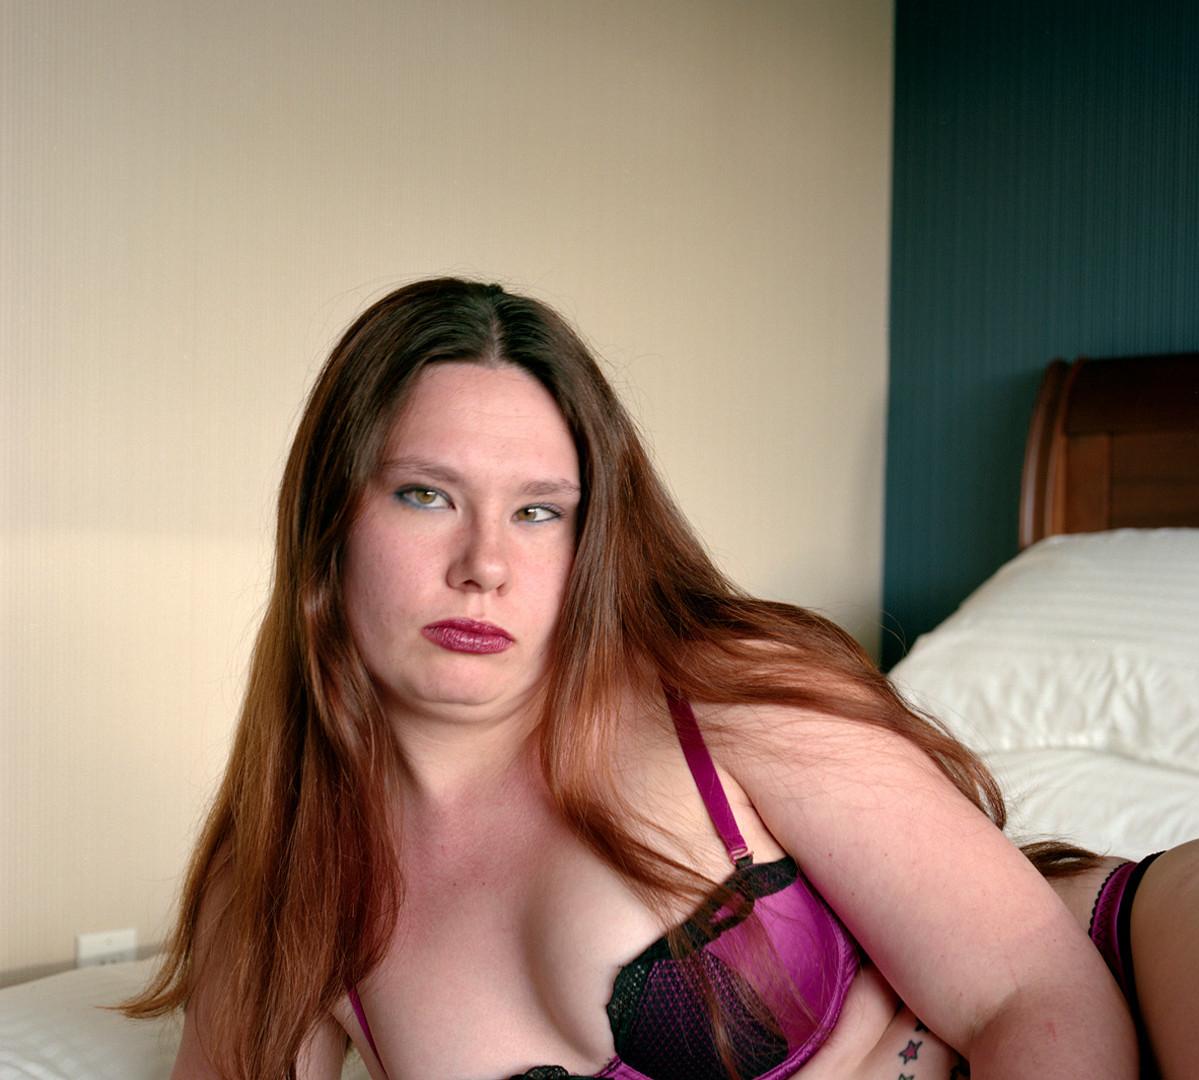 Jocelyn Lee, Untitled (Chrissy on bed), 2009